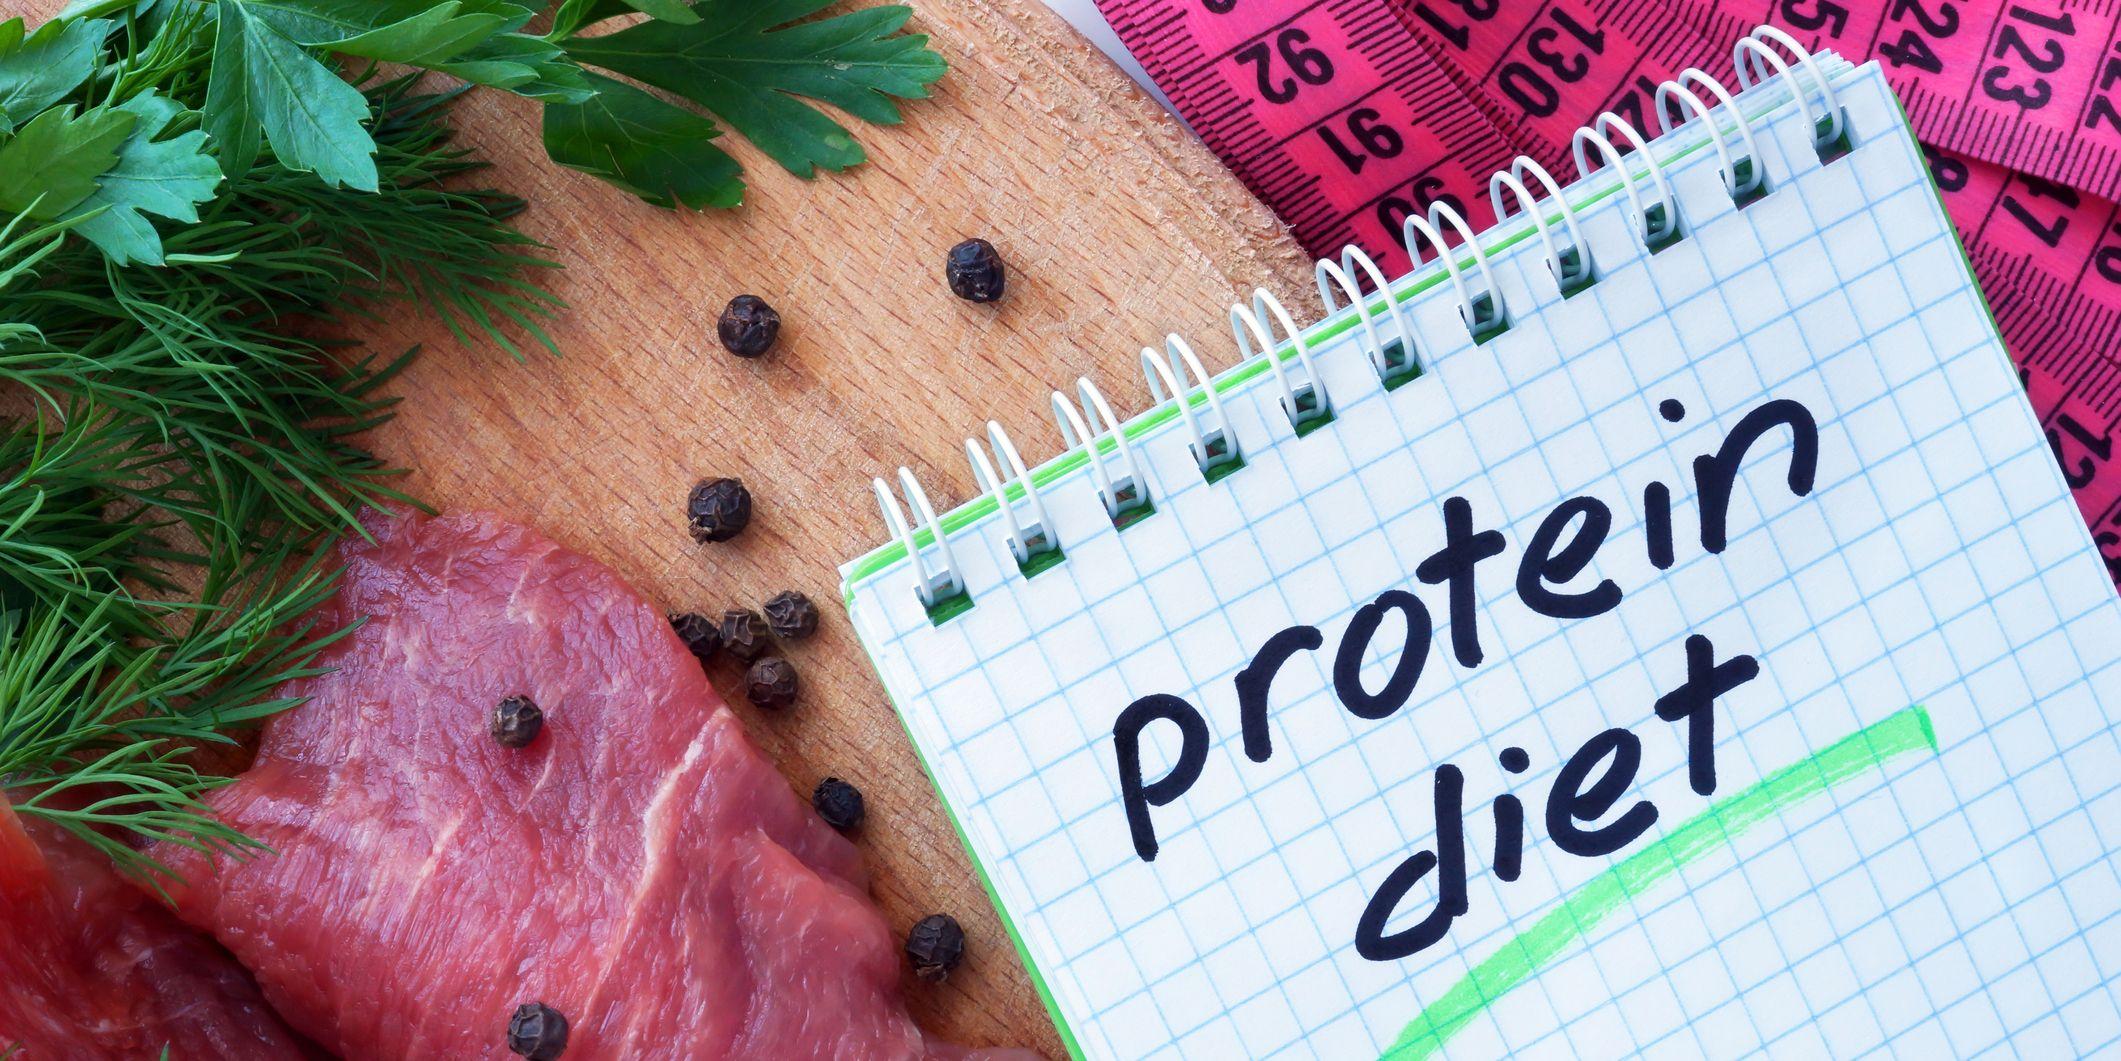 perdita di peso lento 5 2 dieta